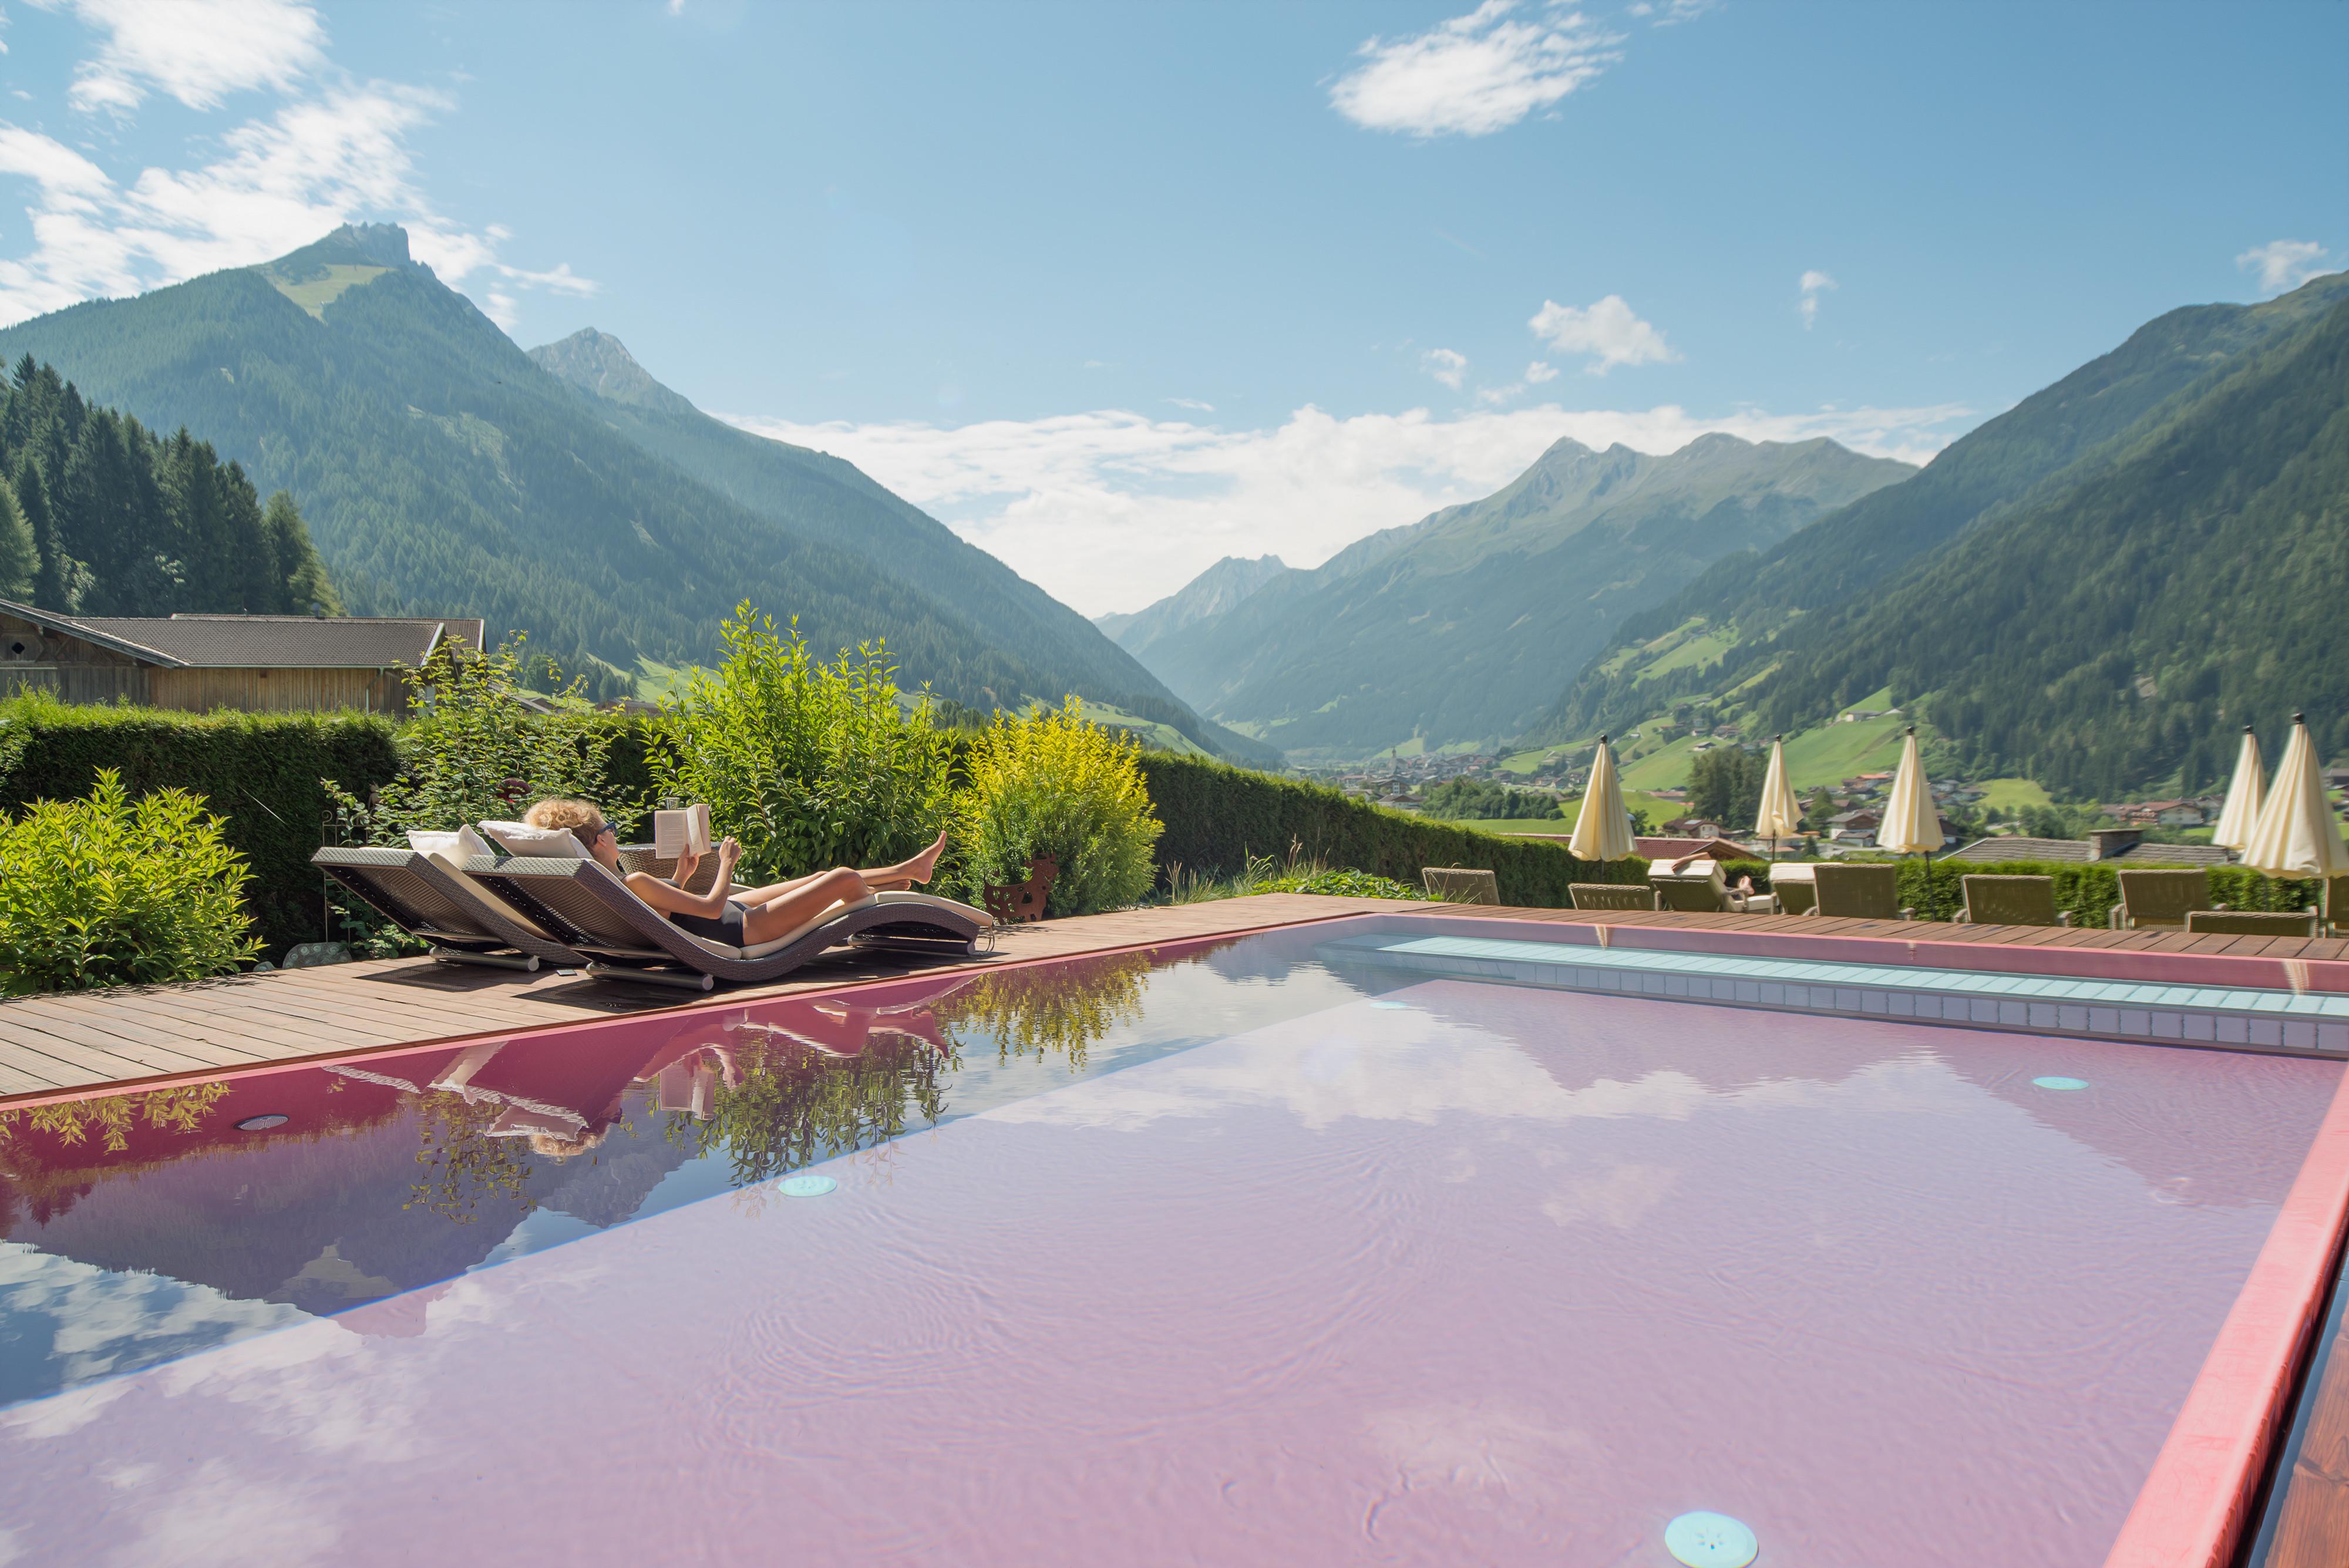 Freibad im wintergarten pool magazin for Design hotel stubaital